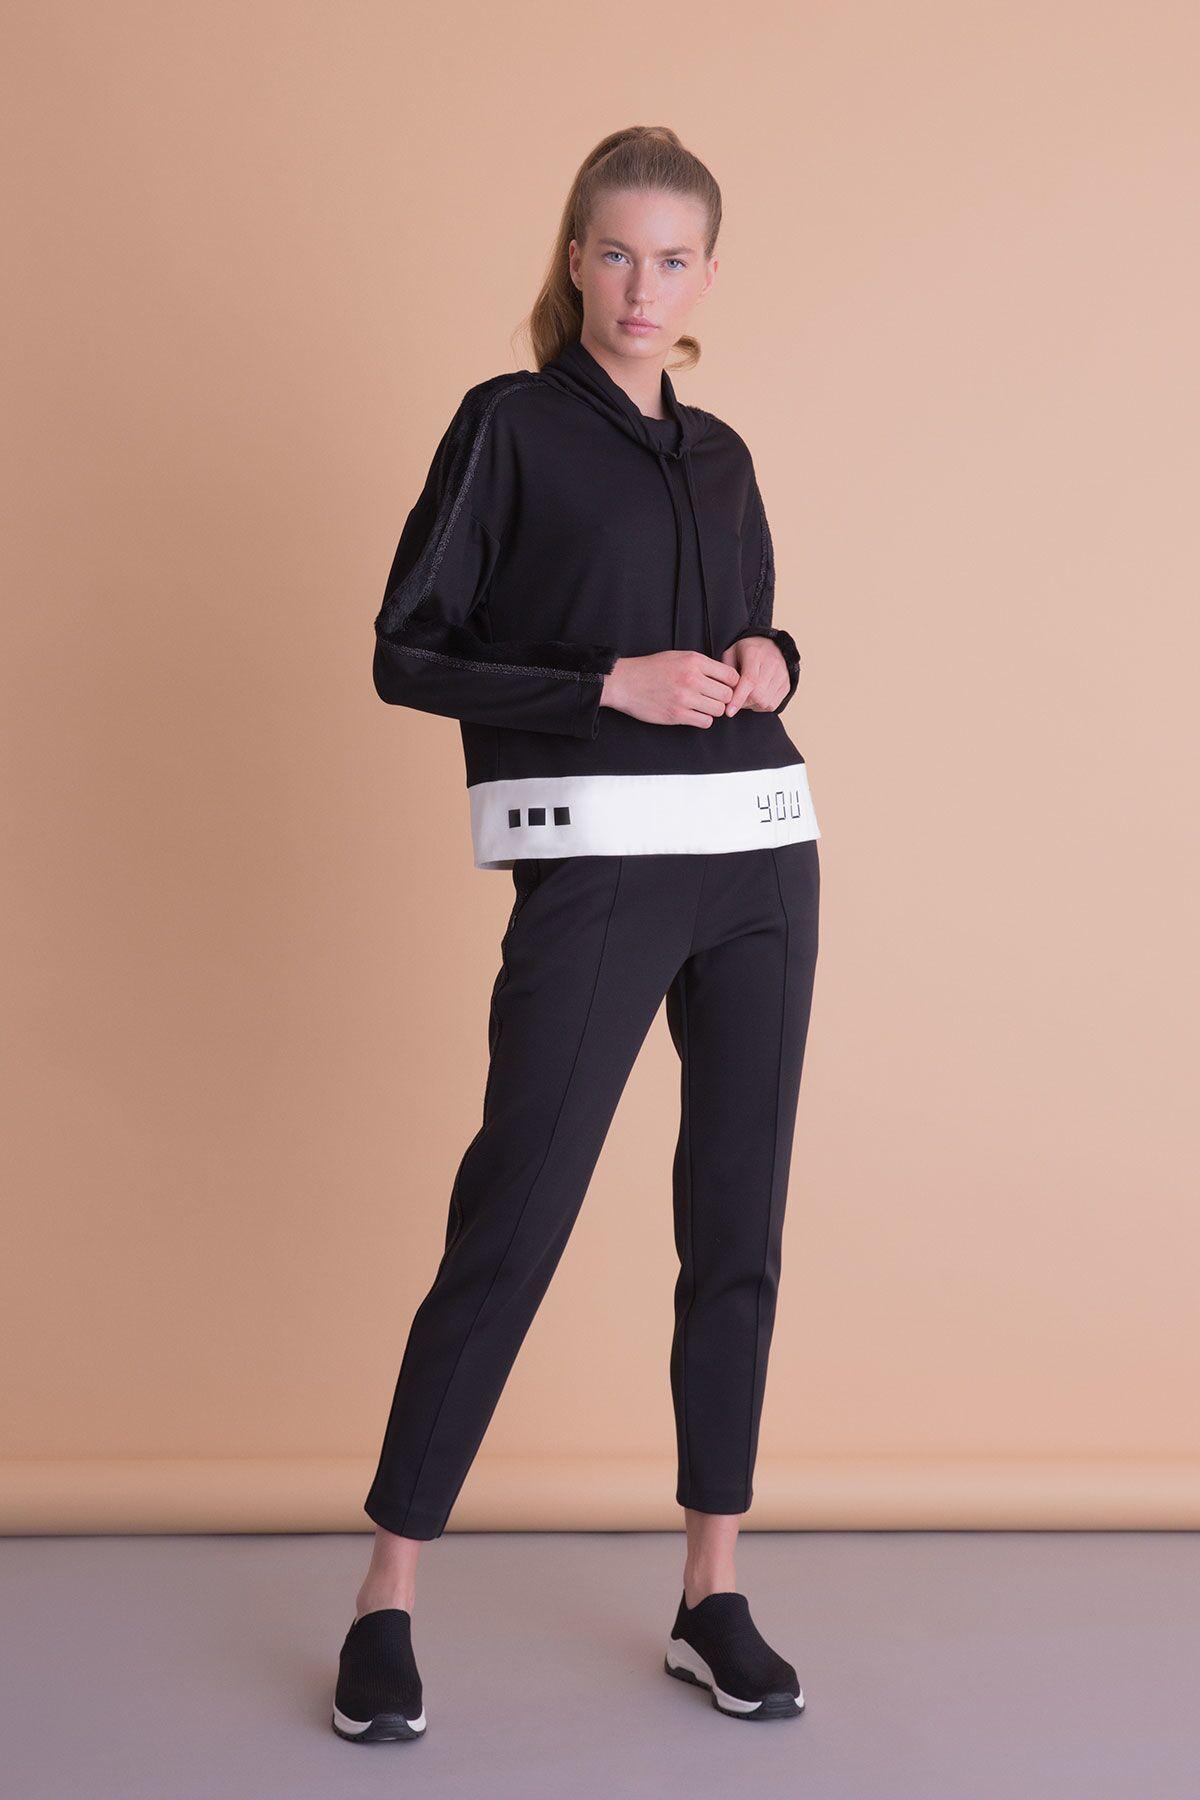 Boyun Bağcıklı Siyah Spor Sweatshirt